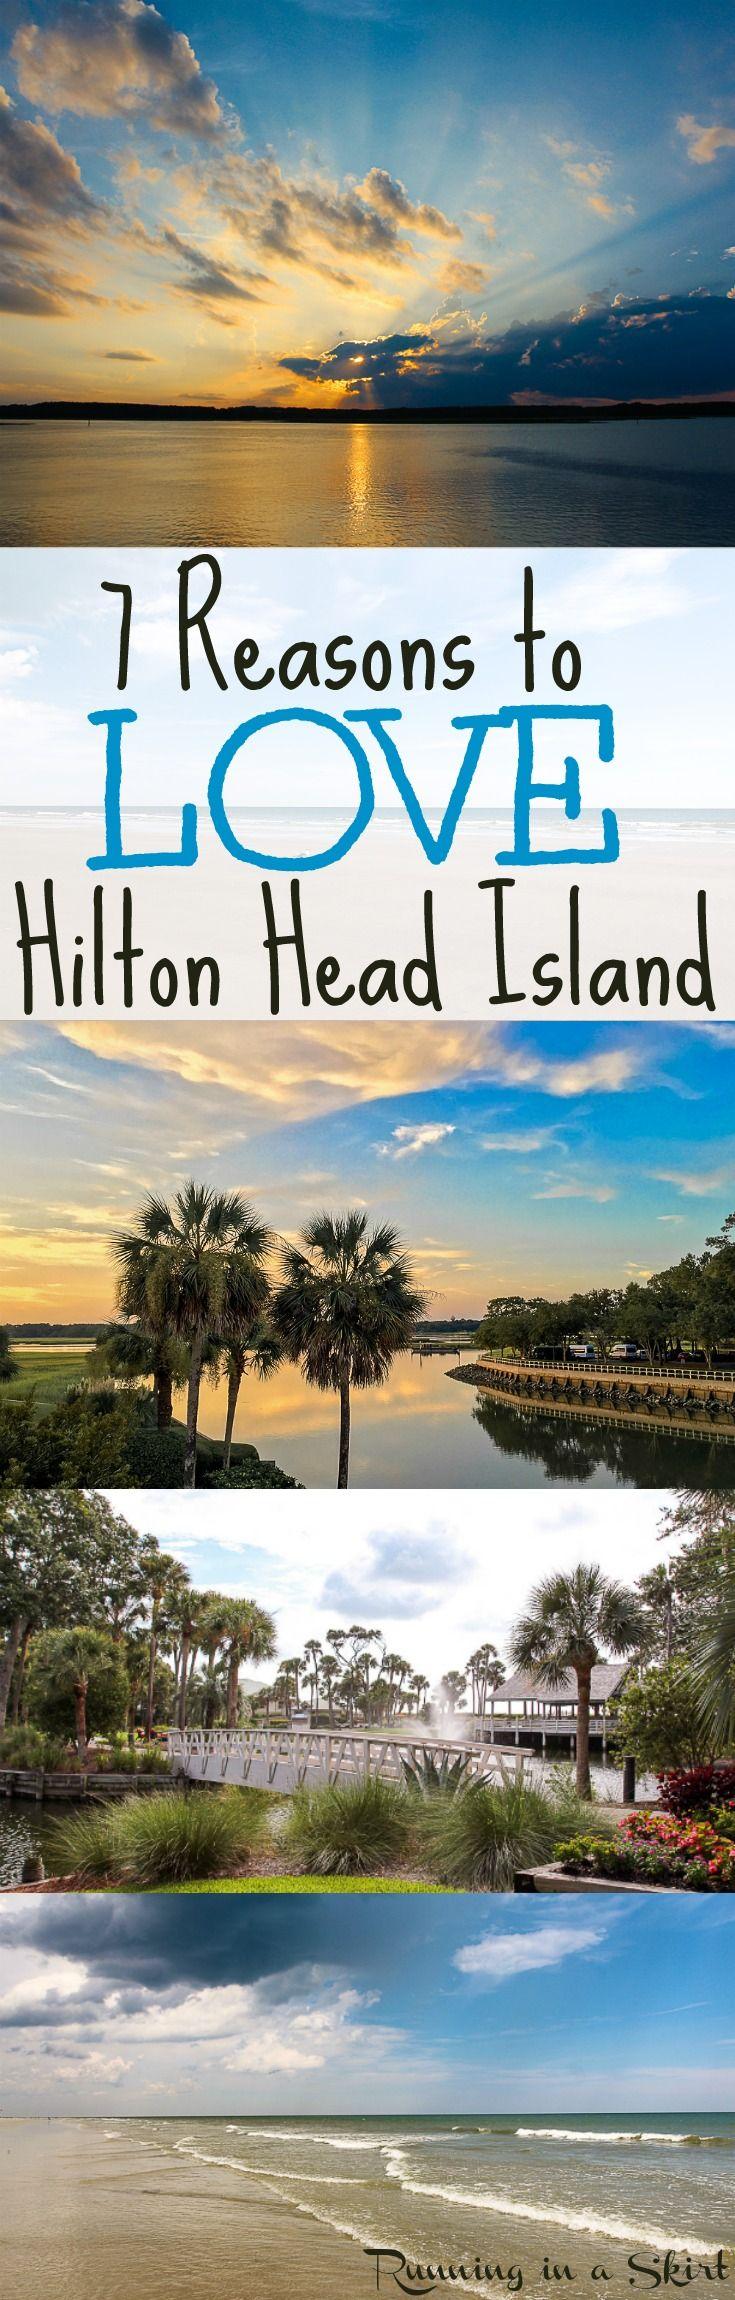 best 10+ hotels hilton head ideas on pinterest | hotels hilton